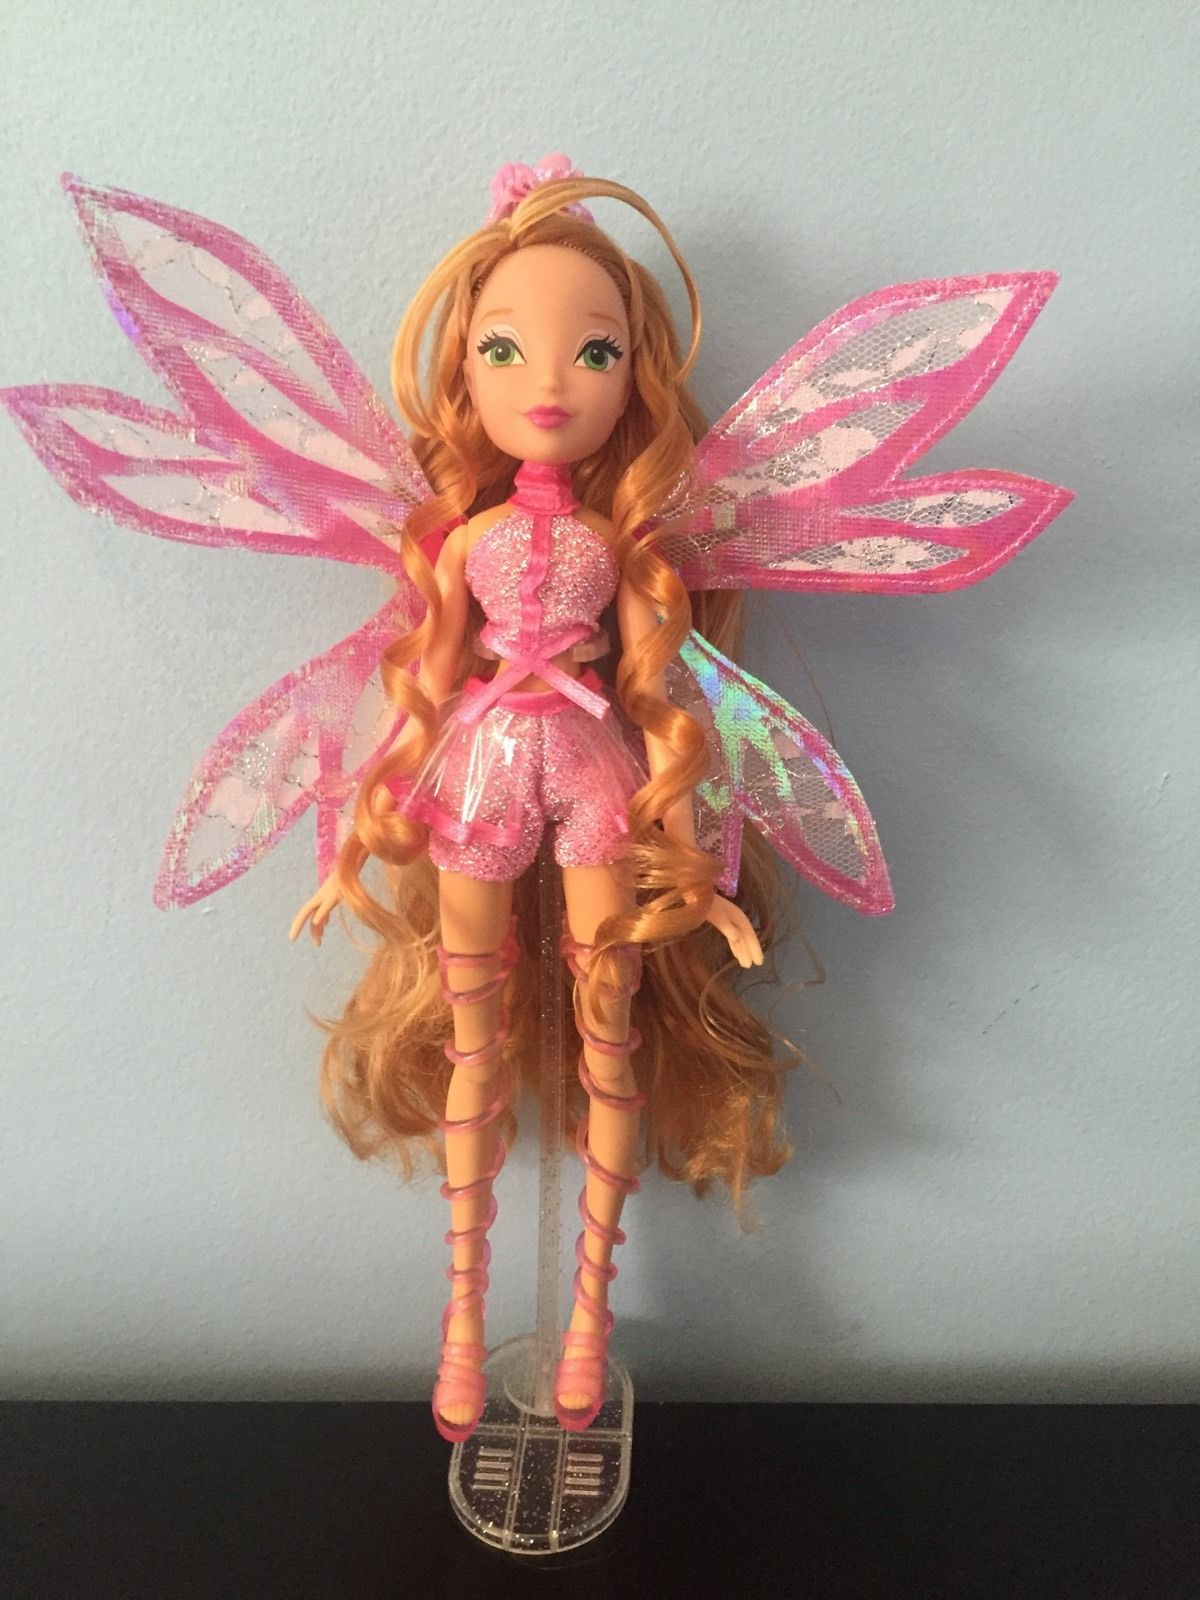 Winx Club Special Limited Edition Kira Plastinina Flora Doll Witty